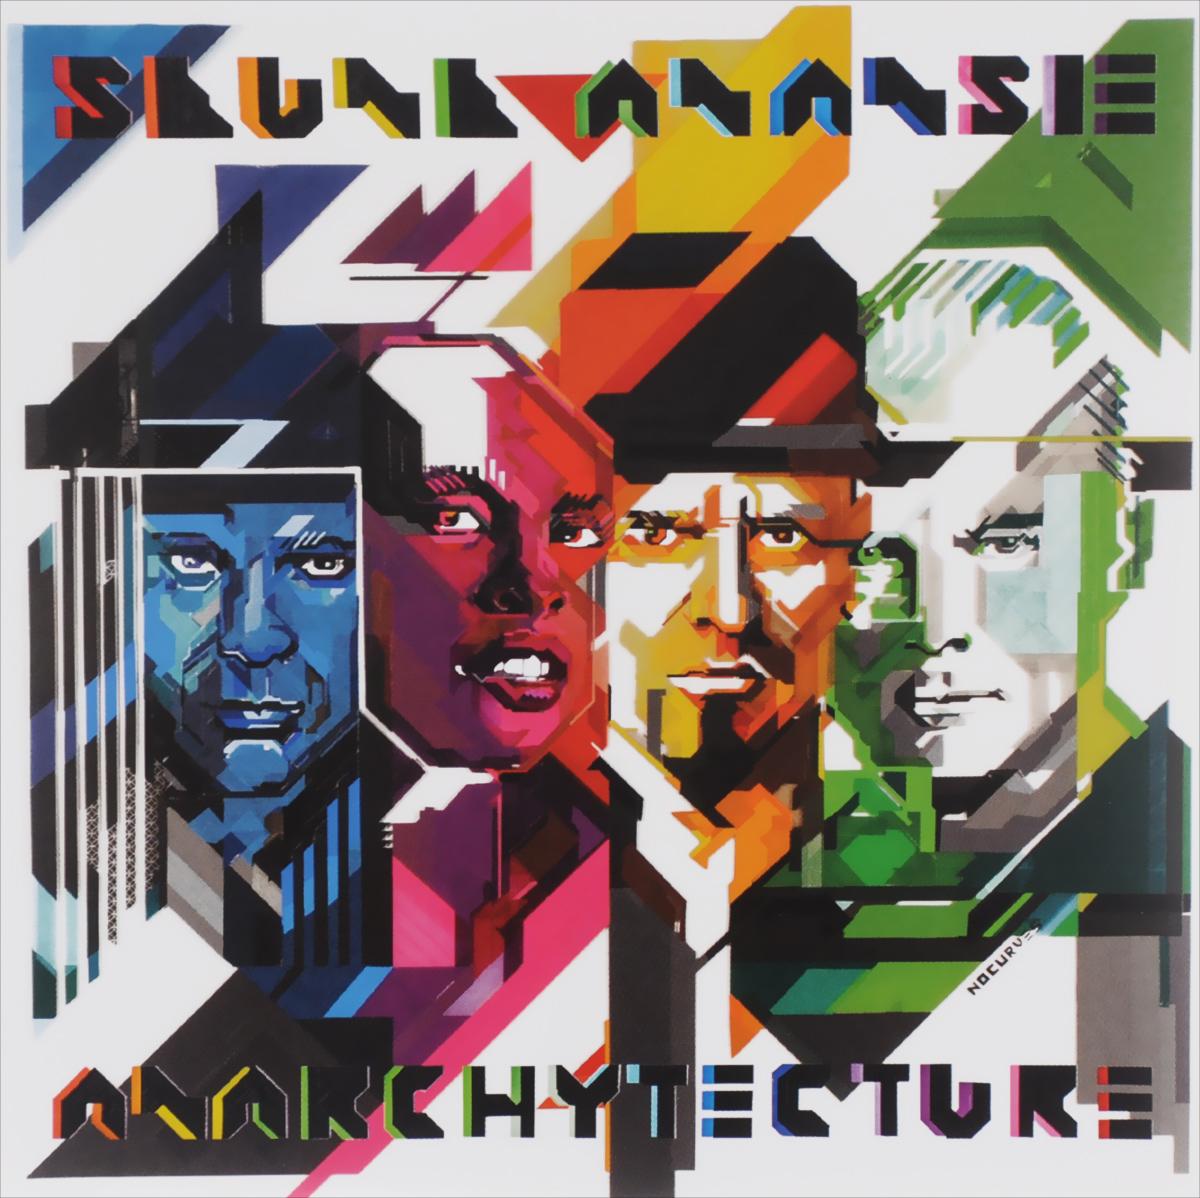 Skunk Anansie Skunk Anansie. Anarchytecture skunk anansie an acoustic live in london blu ray